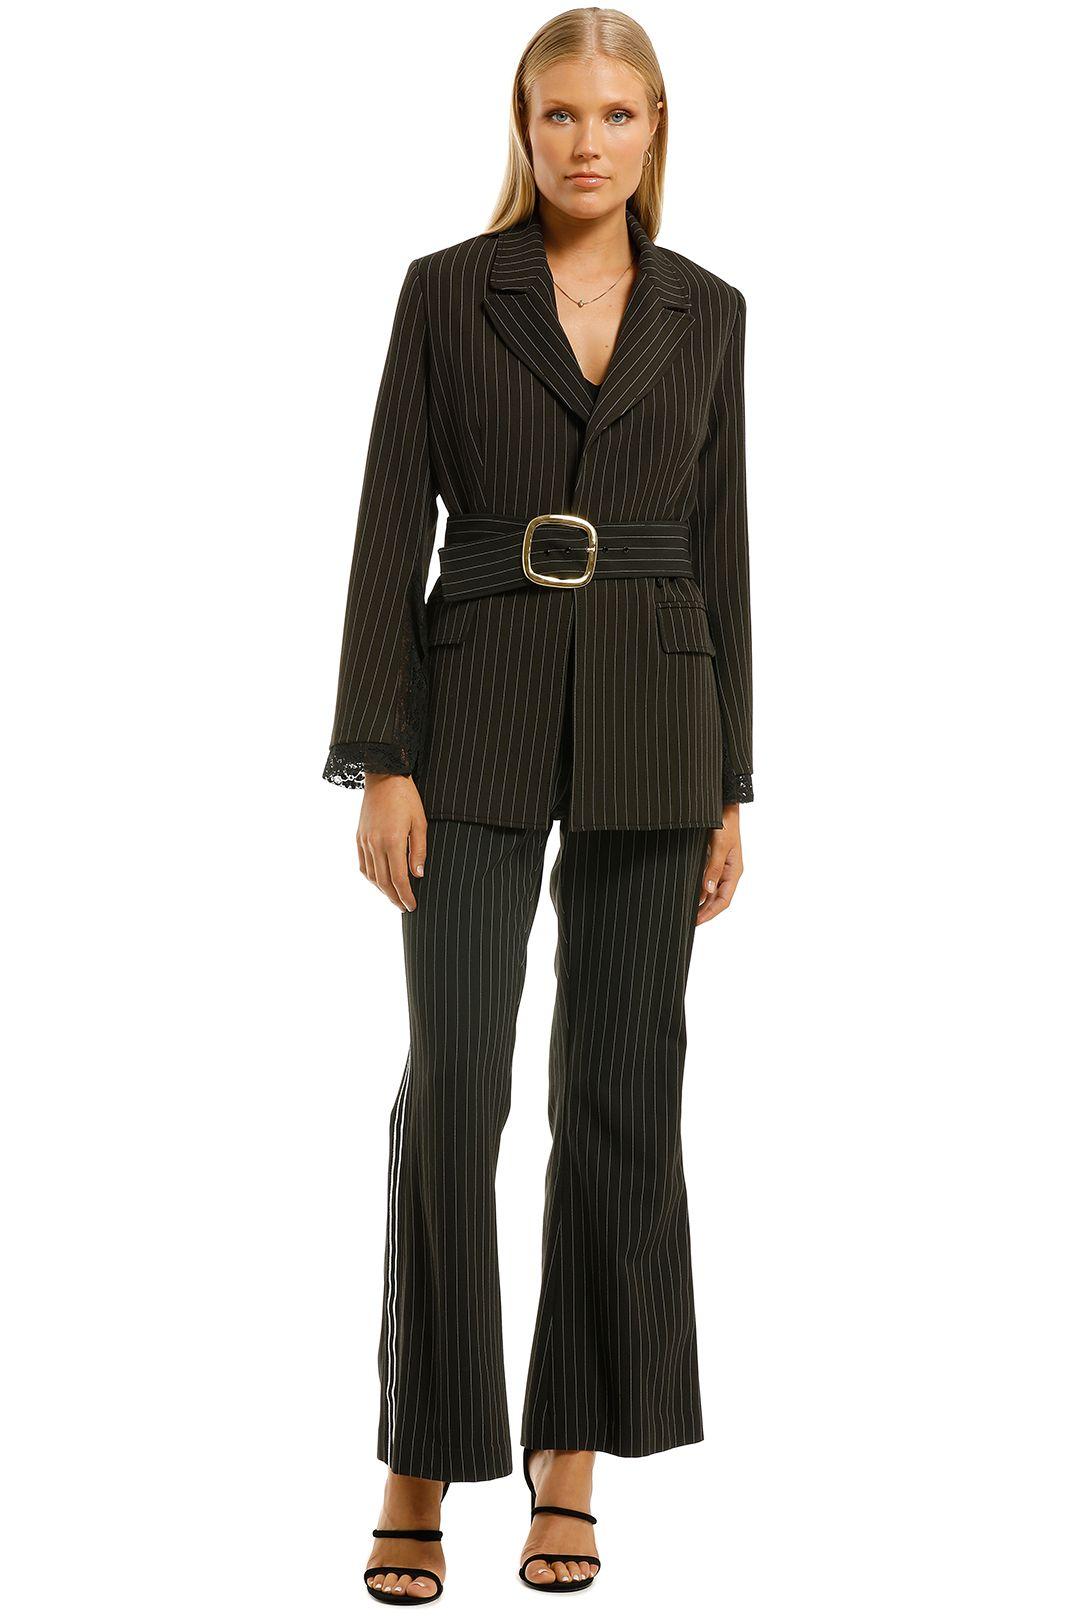 Trelise-Cooper-Draw-Me-Close-Jacket-She's-Got-Flare-Trouser-Set-Front